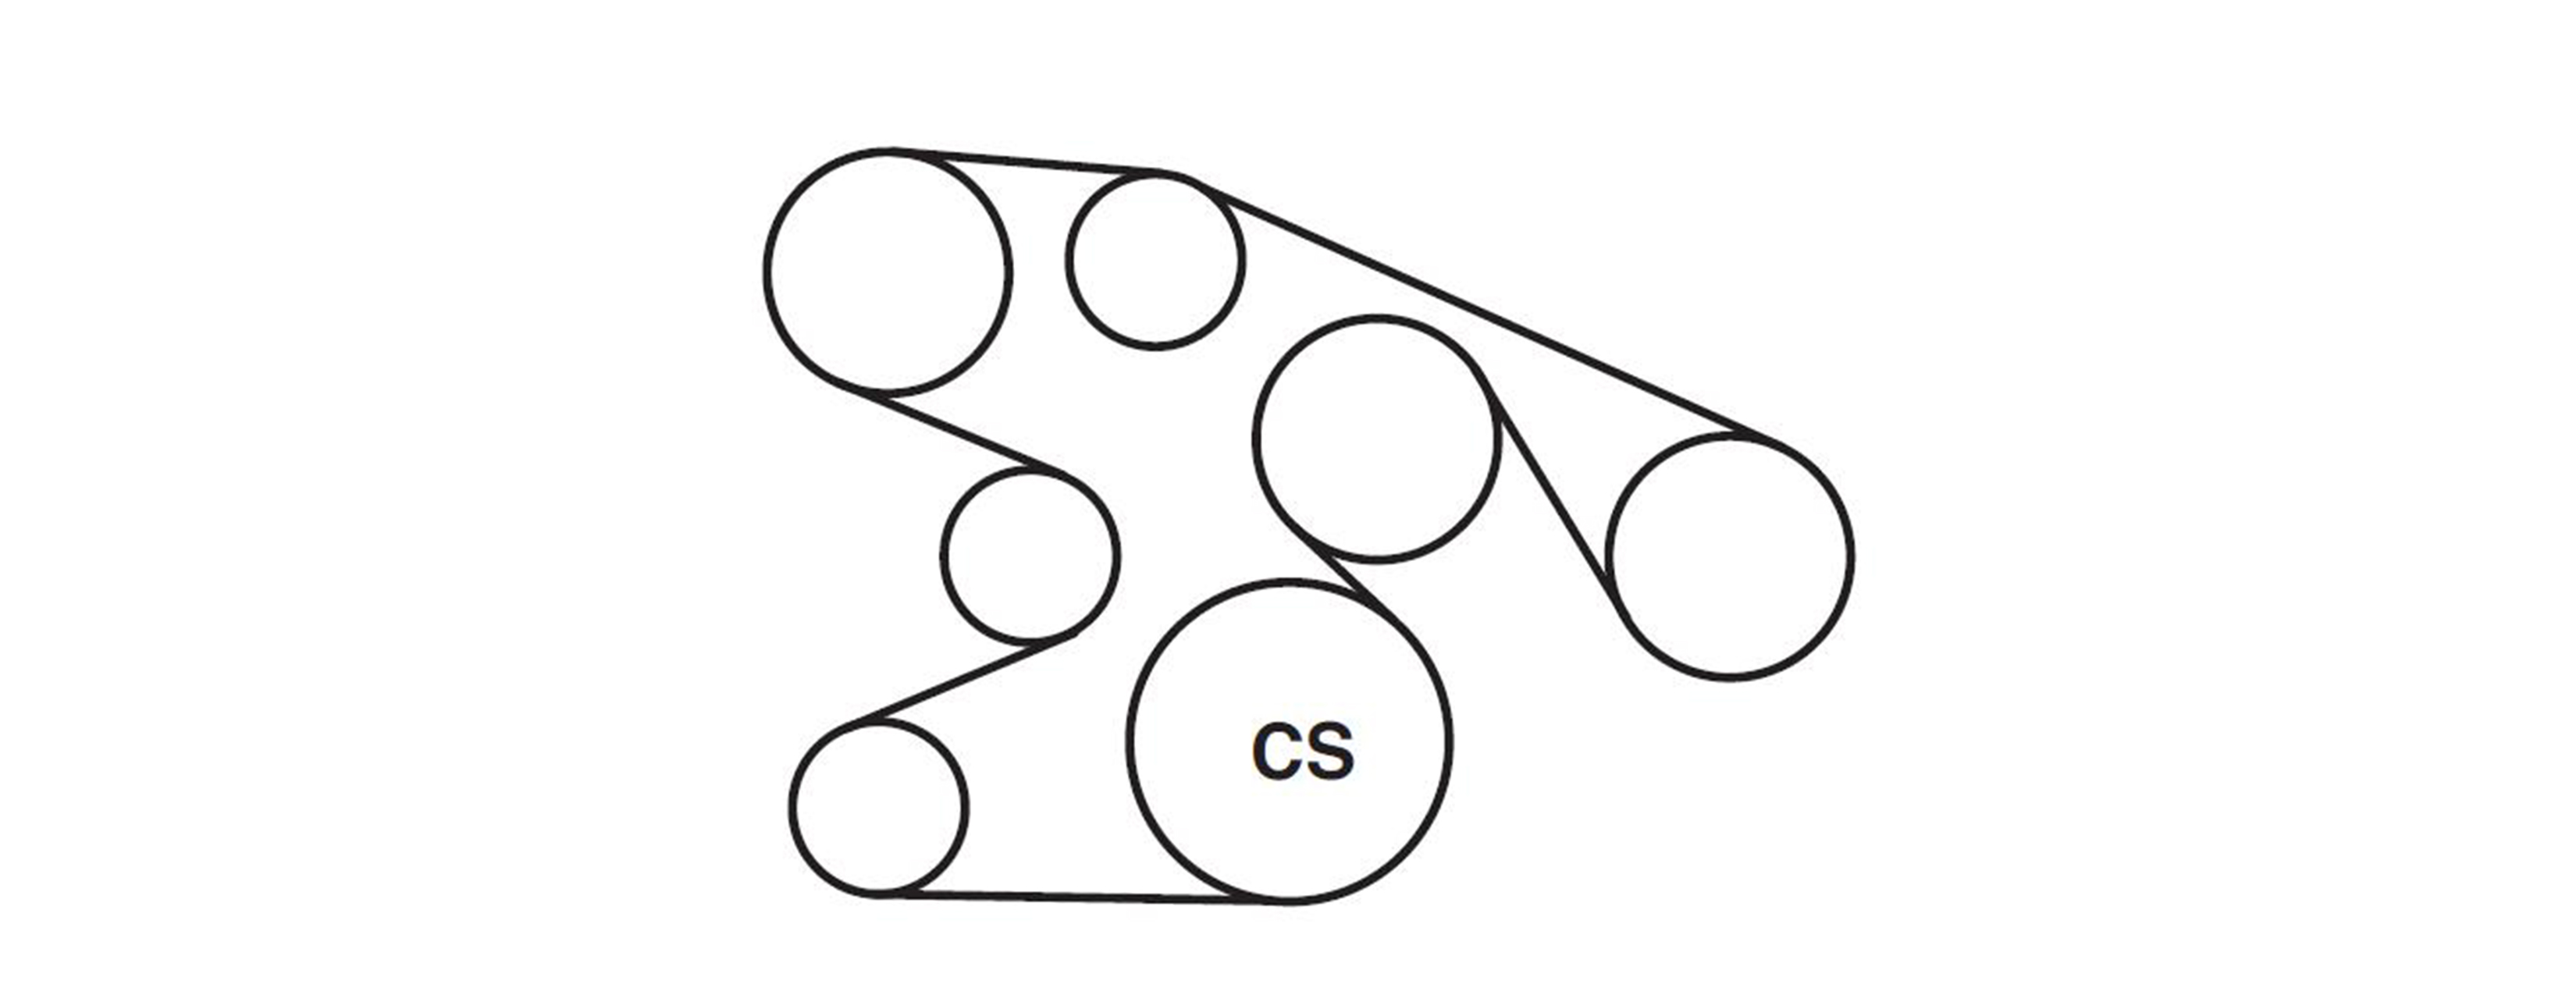 Ford F150 Coolant Diagram